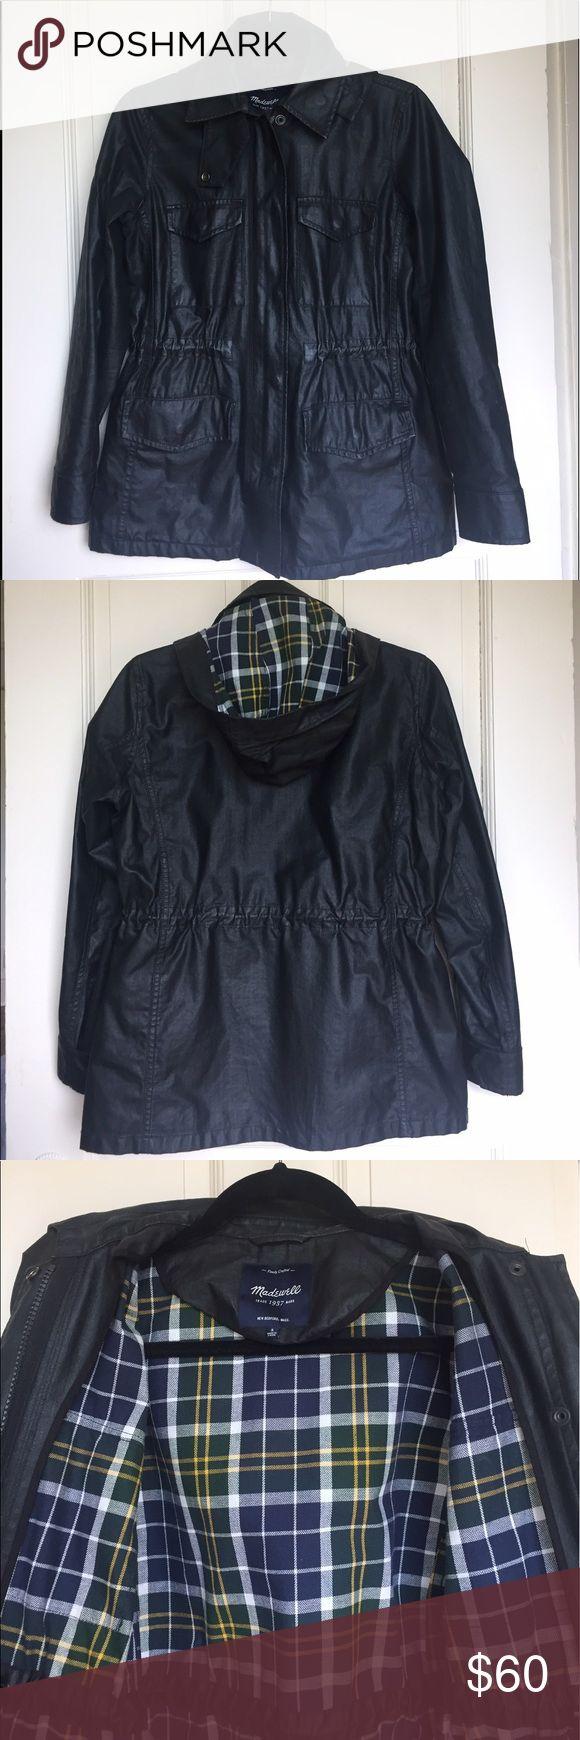 Selling this Black madewell rain jacket on Poshmark! My username is: hrbelanger. #shopmycloset #poshmark #fashion #shopping #style #forsale #Madewell #Jackets & Blazers